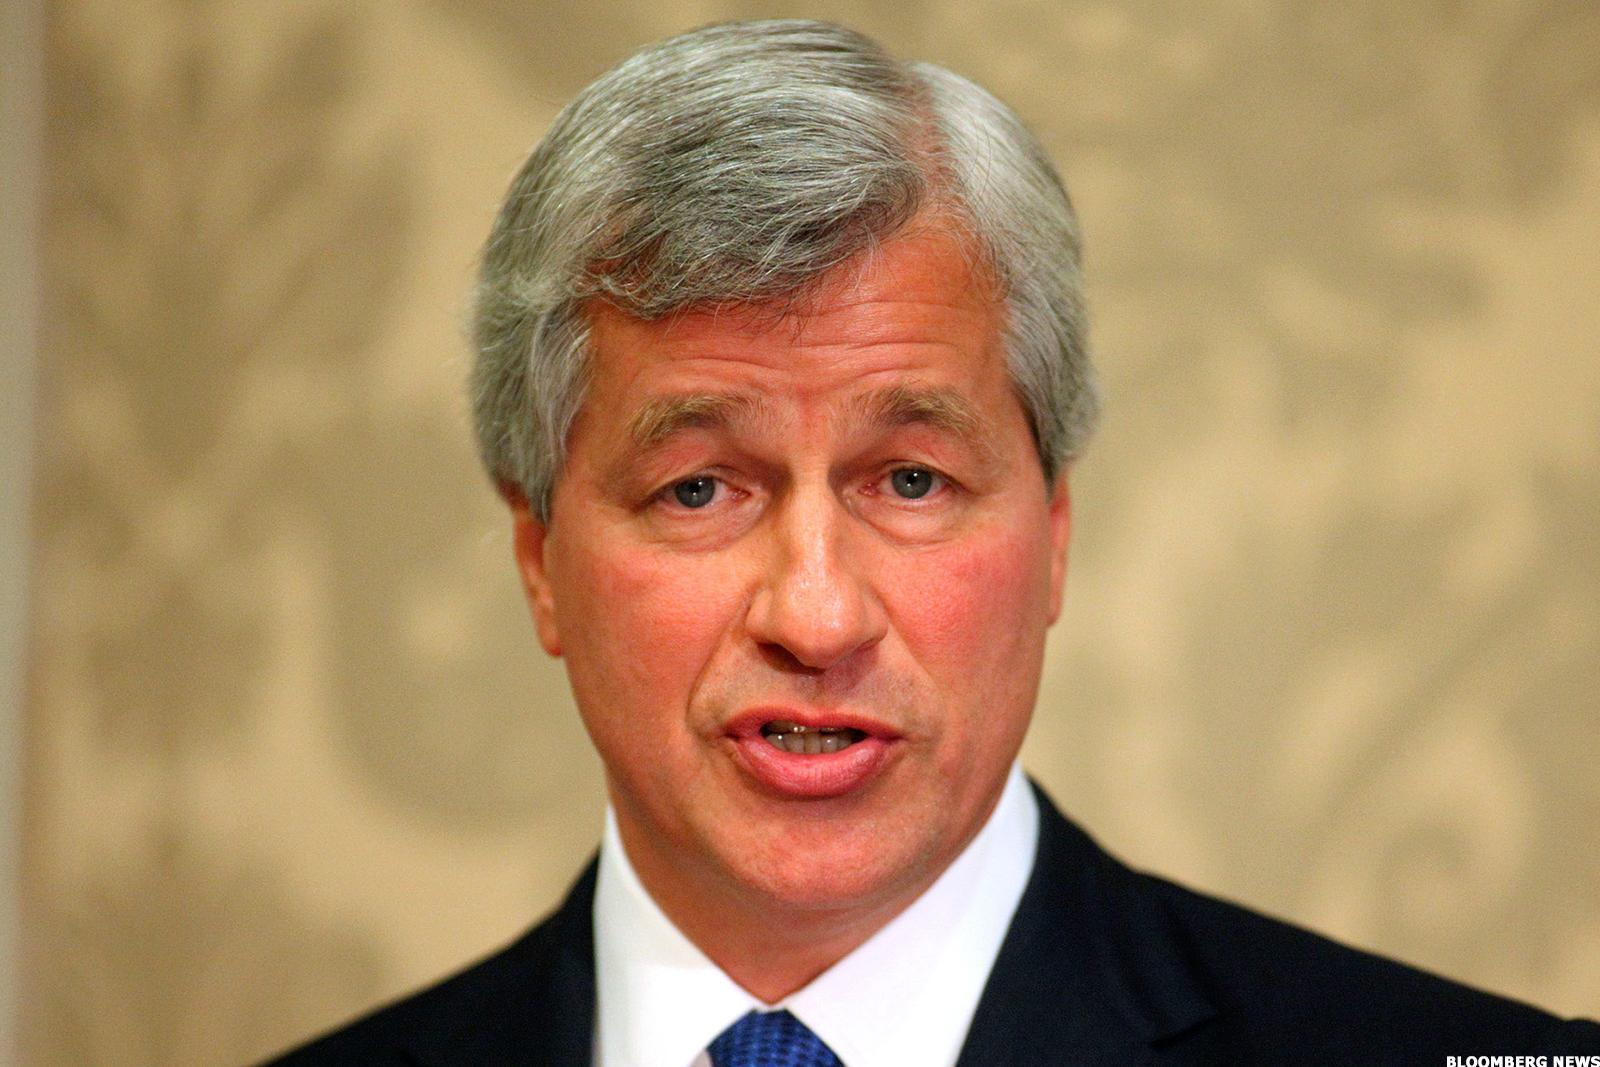 JPMorgan Boosts CEO Jamie Dimon's Pay $29 5 Million as